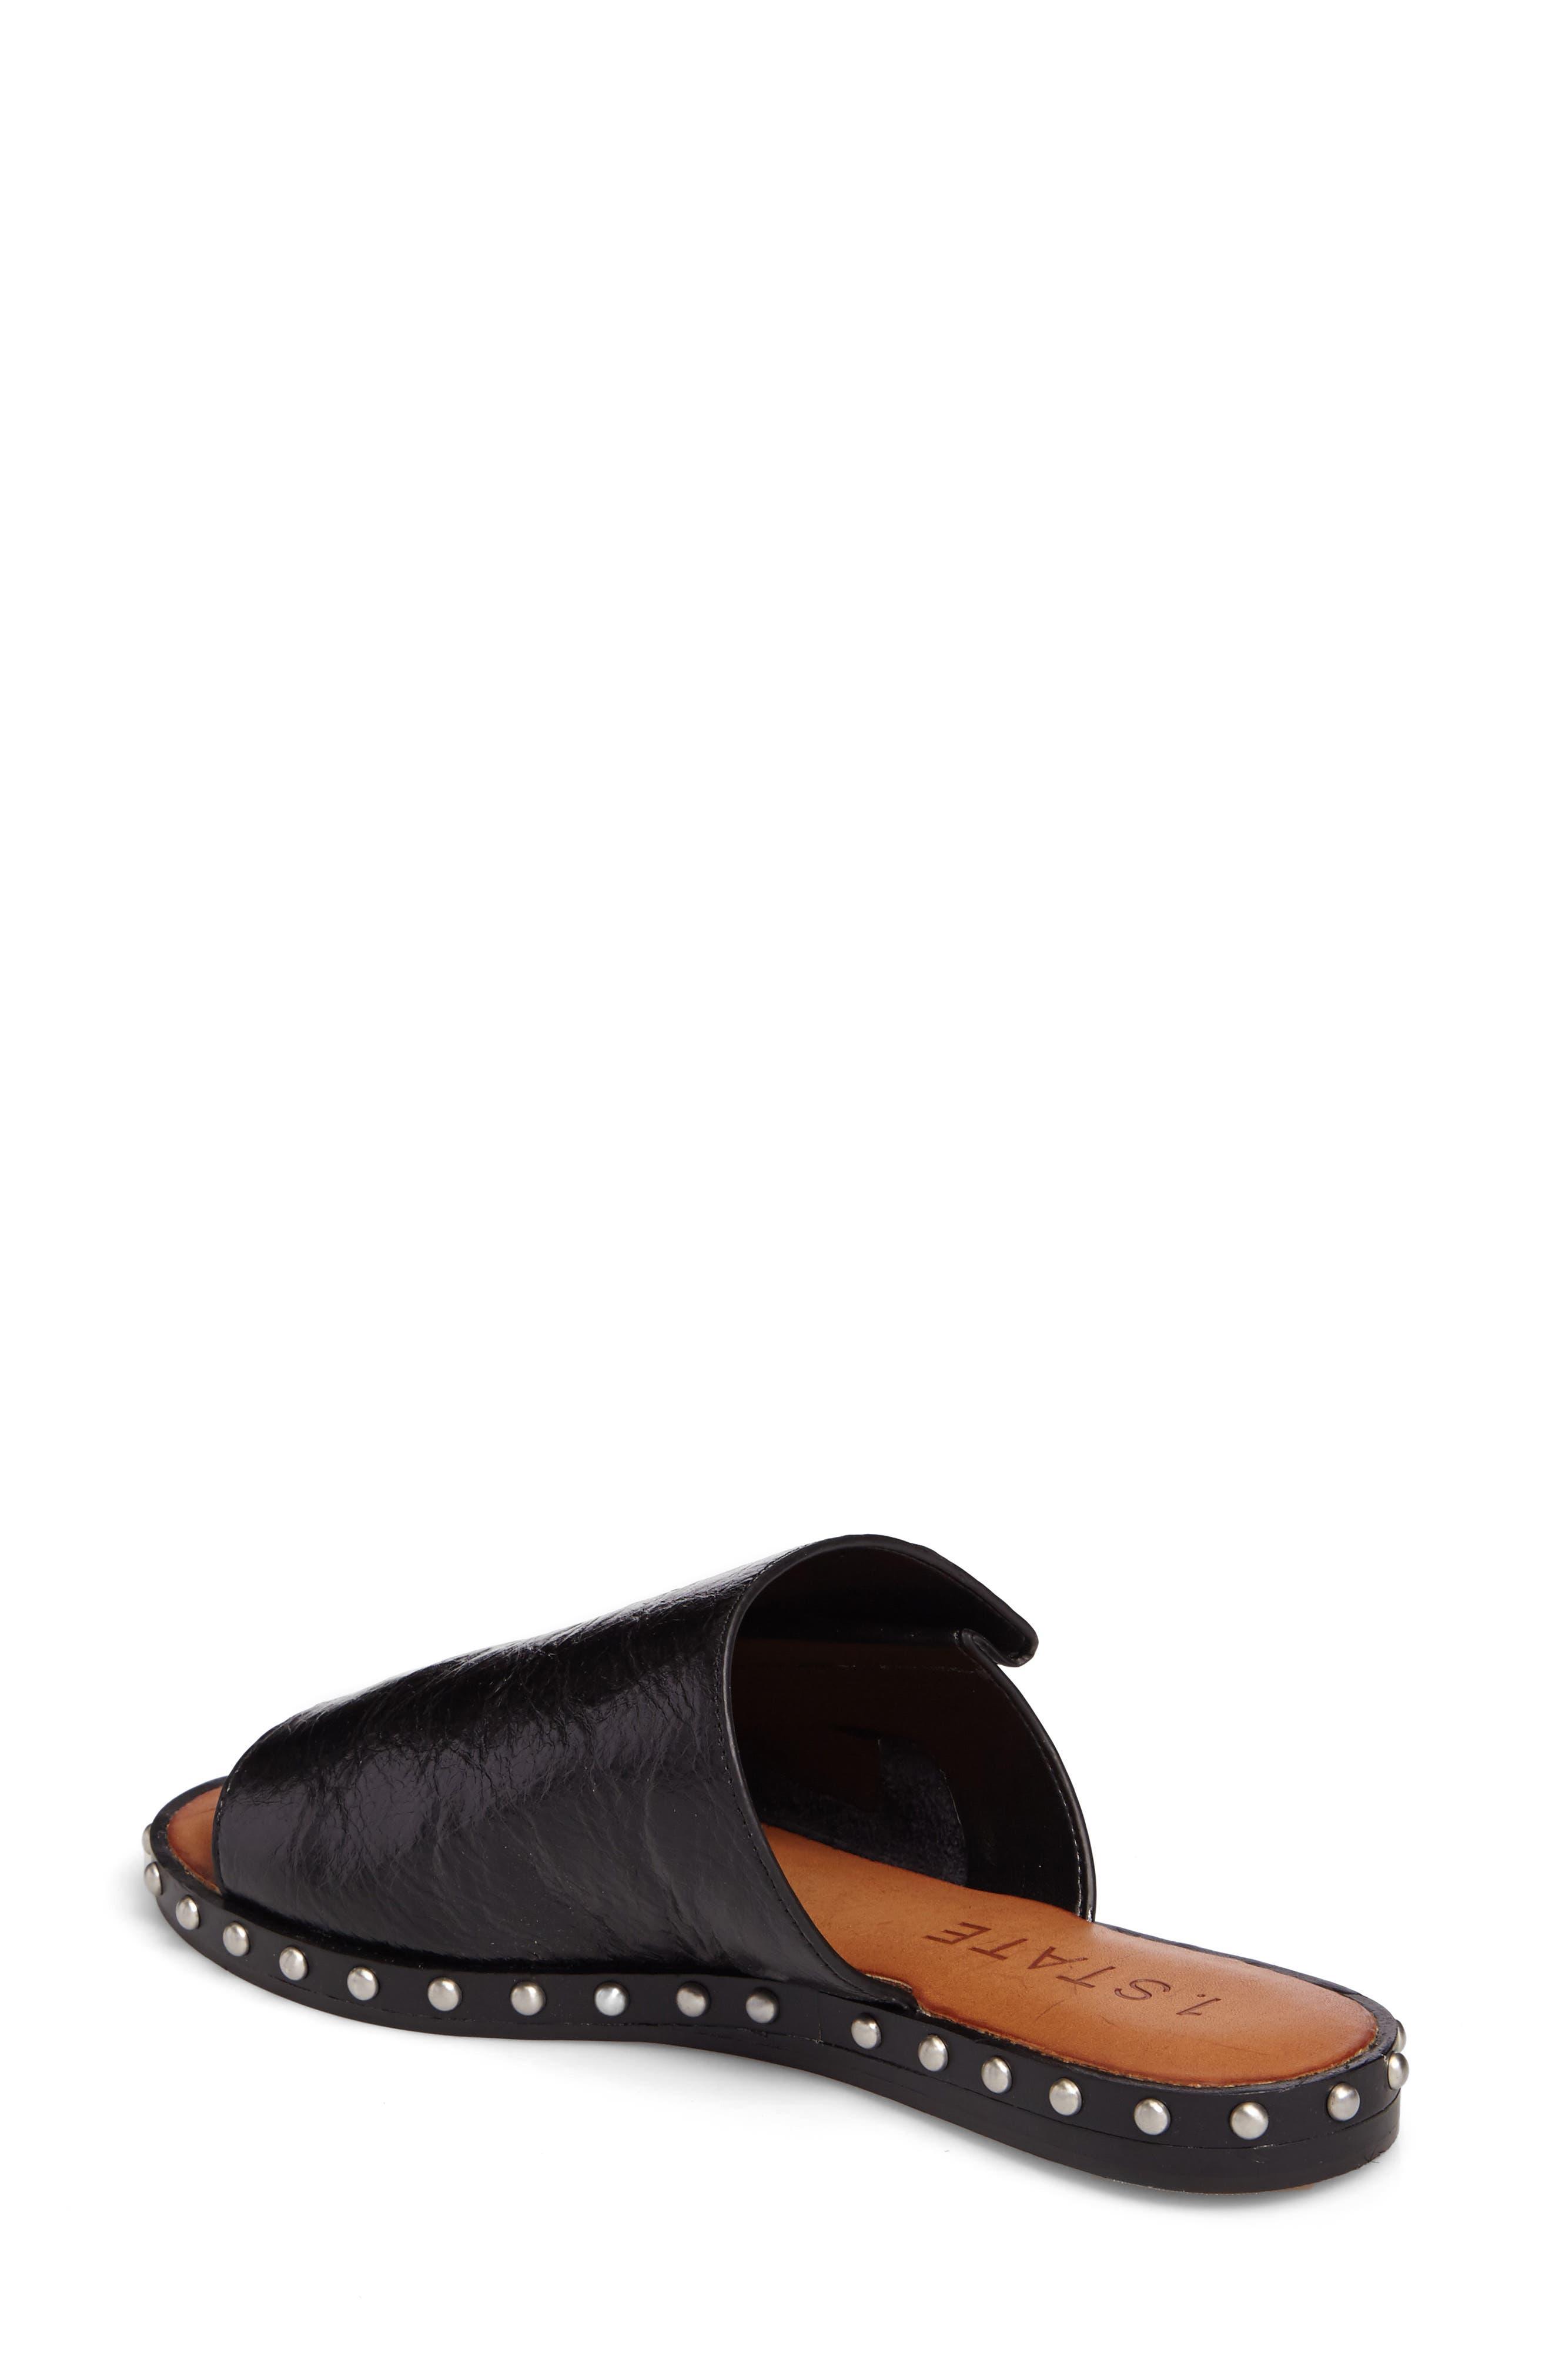 Cadwyn Slide Sandal,                             Alternate thumbnail 2, color,                             Black Leather